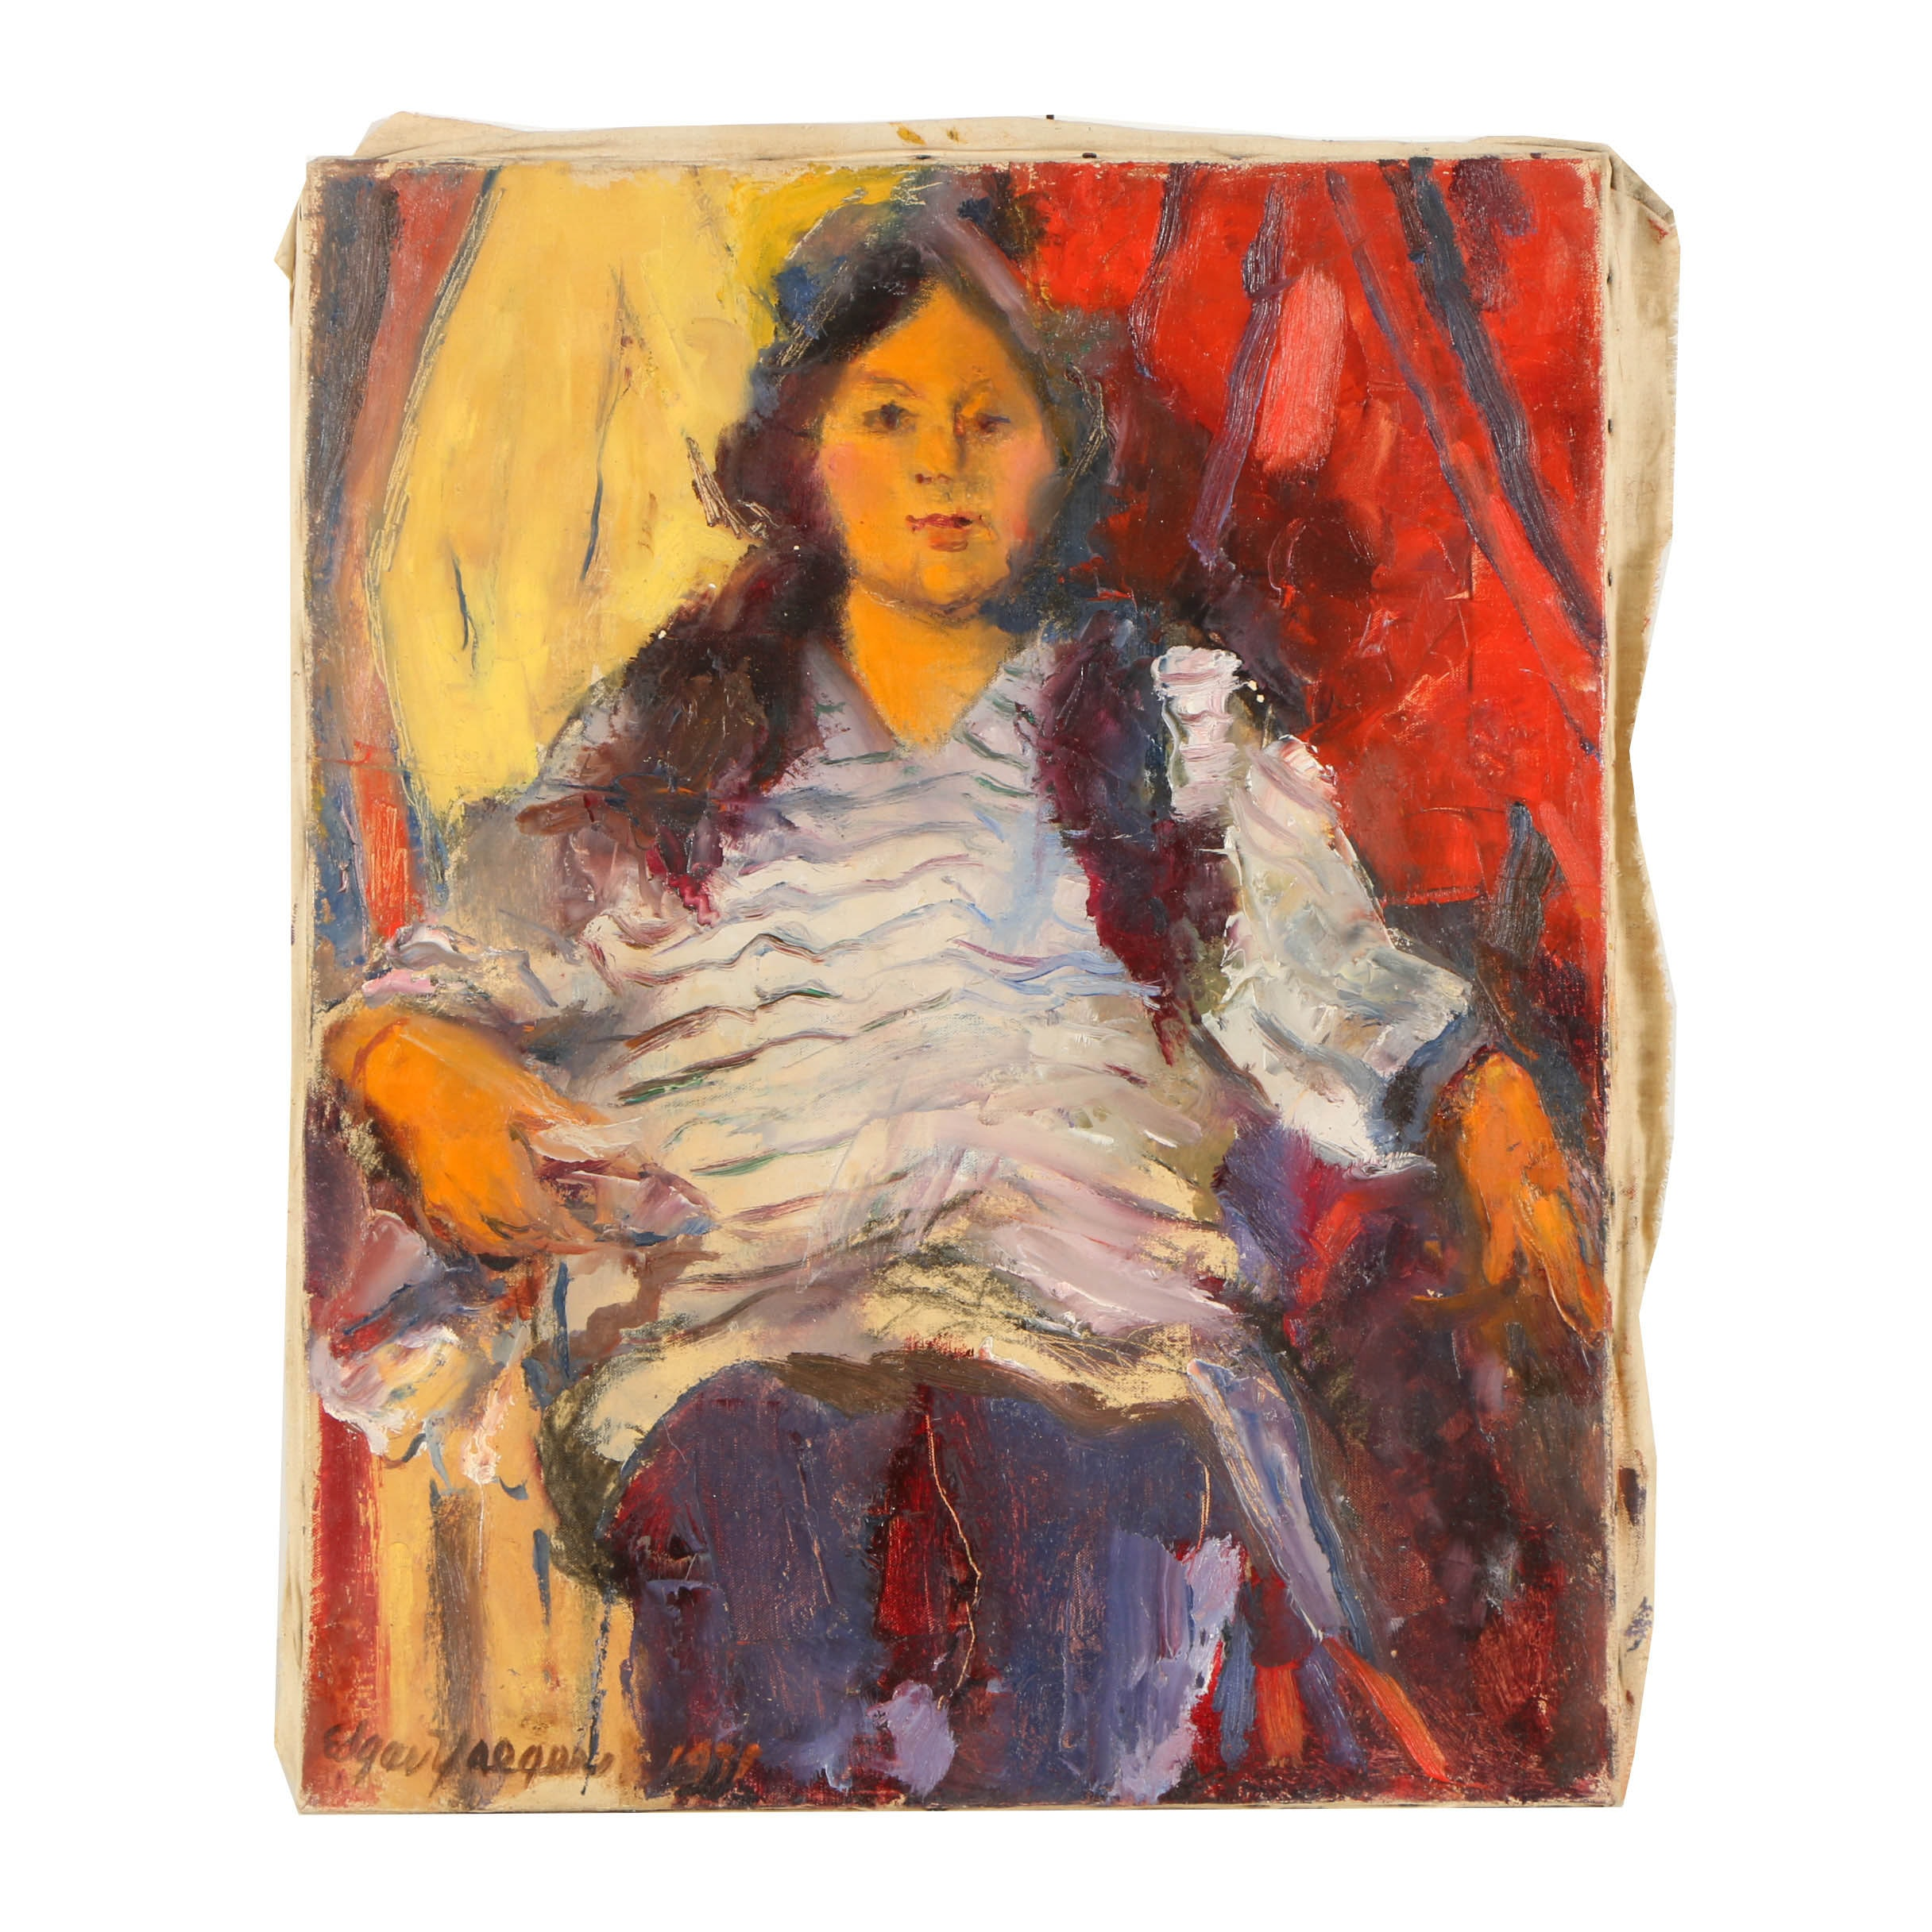 Edgar Yaeger Oil Painting on Canvas Portrait of Brunette Woman